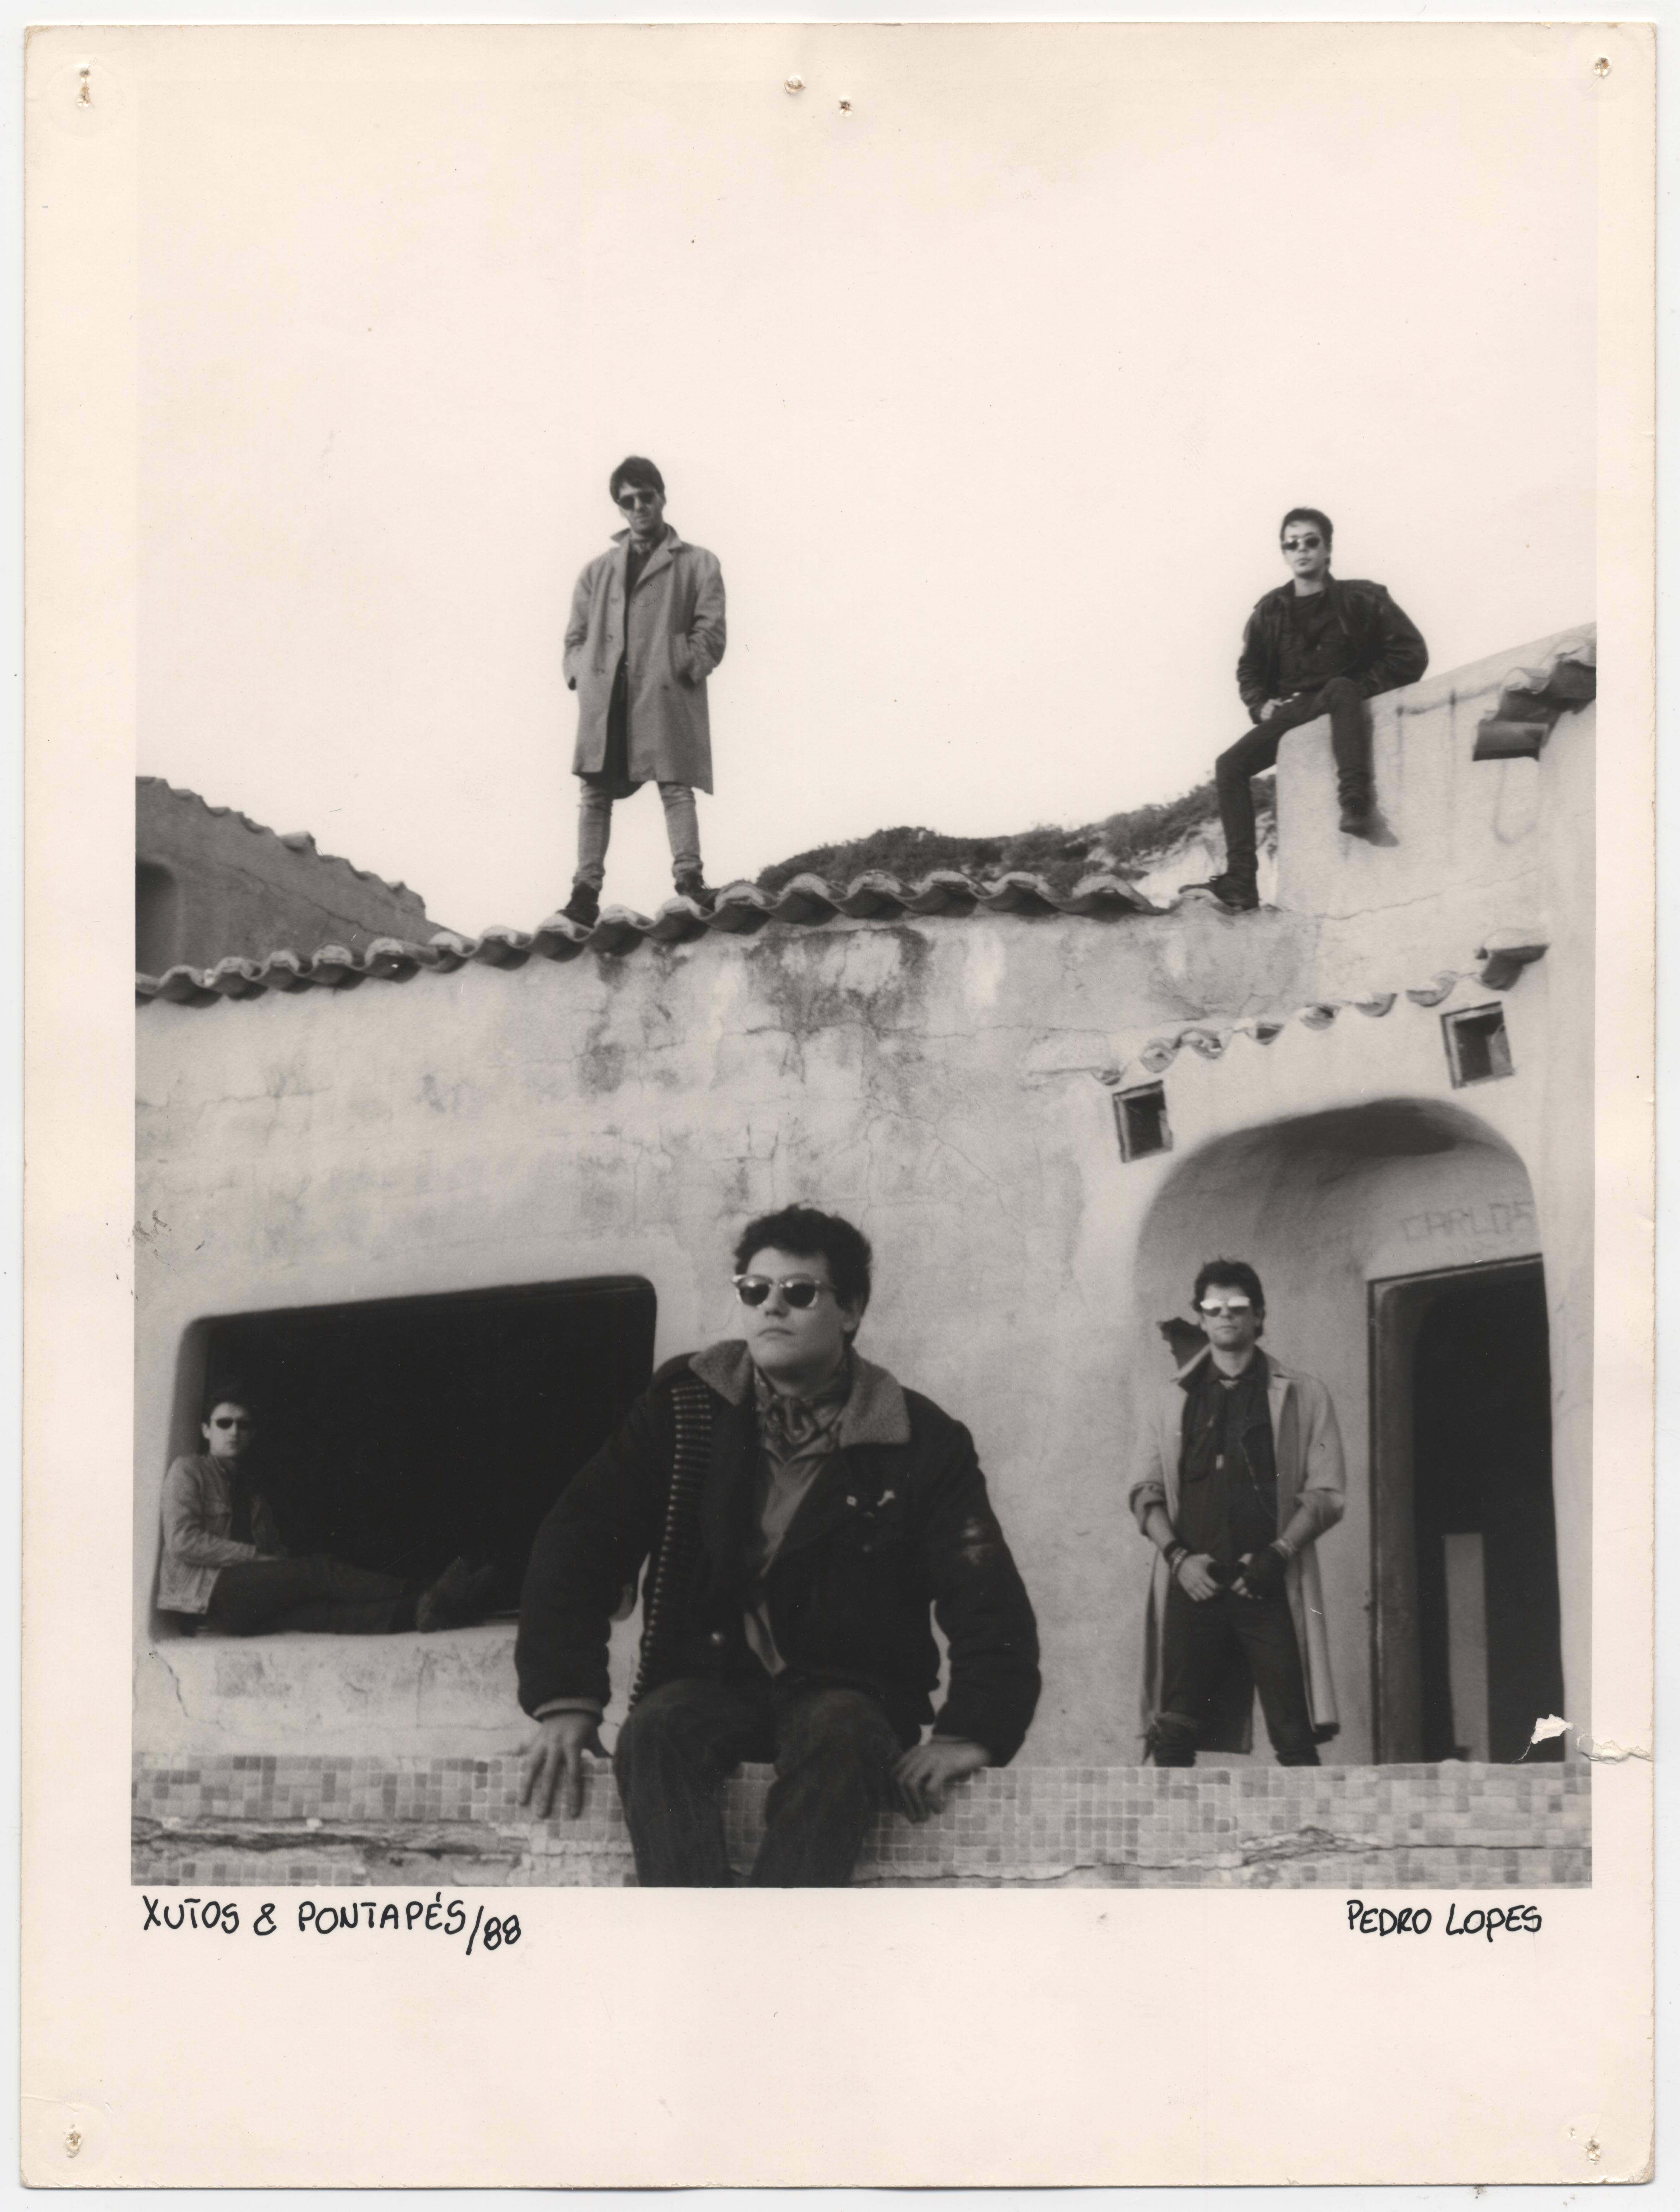 1988 Banda – Pedro Lopes